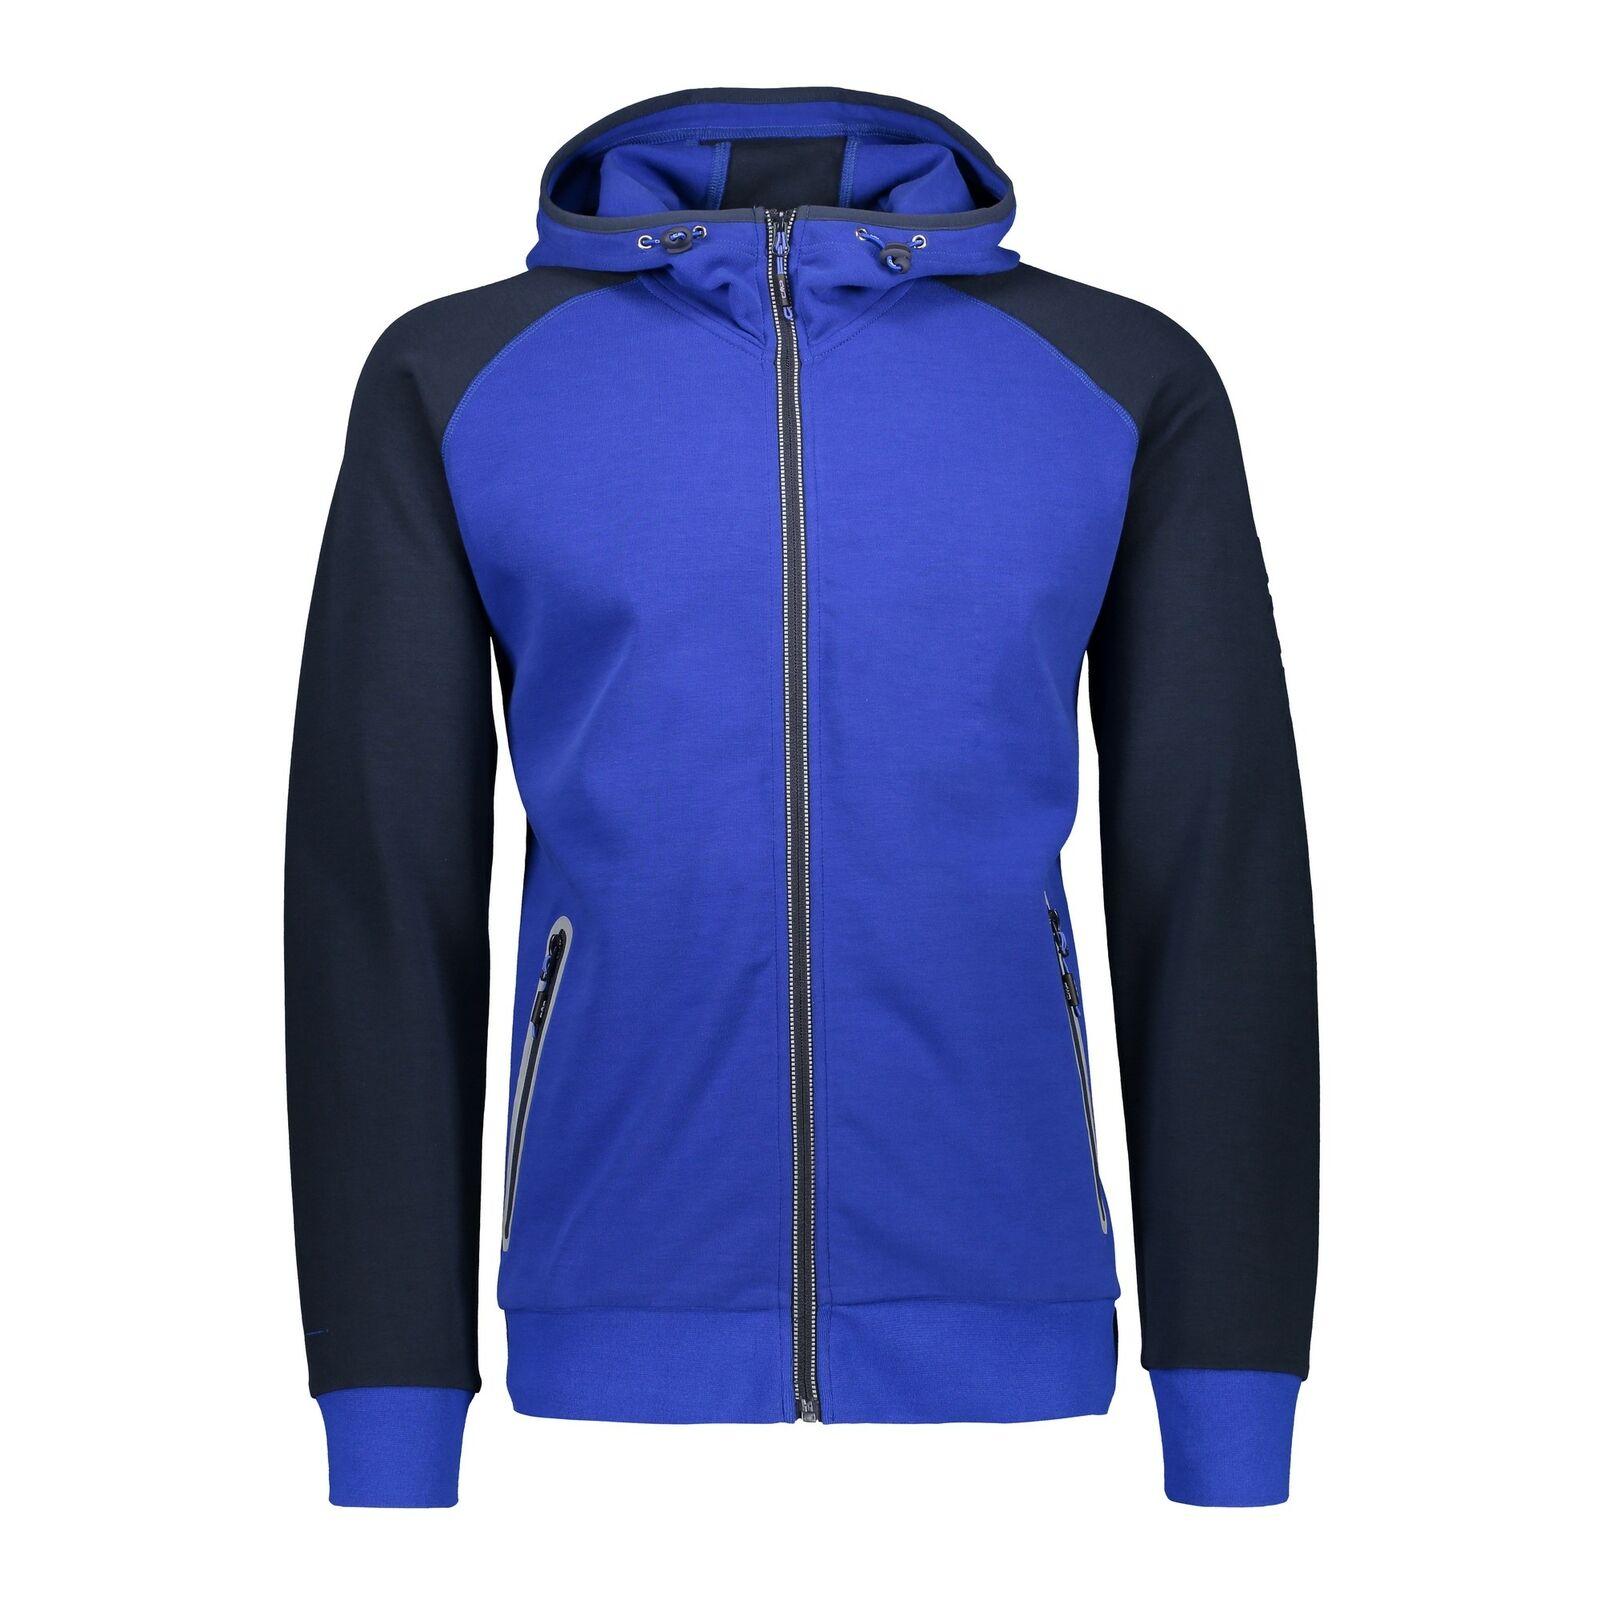 CMP Pinewood chaqueta Man fix Hood Jacket azul transpirable elástico  ahumado  barato